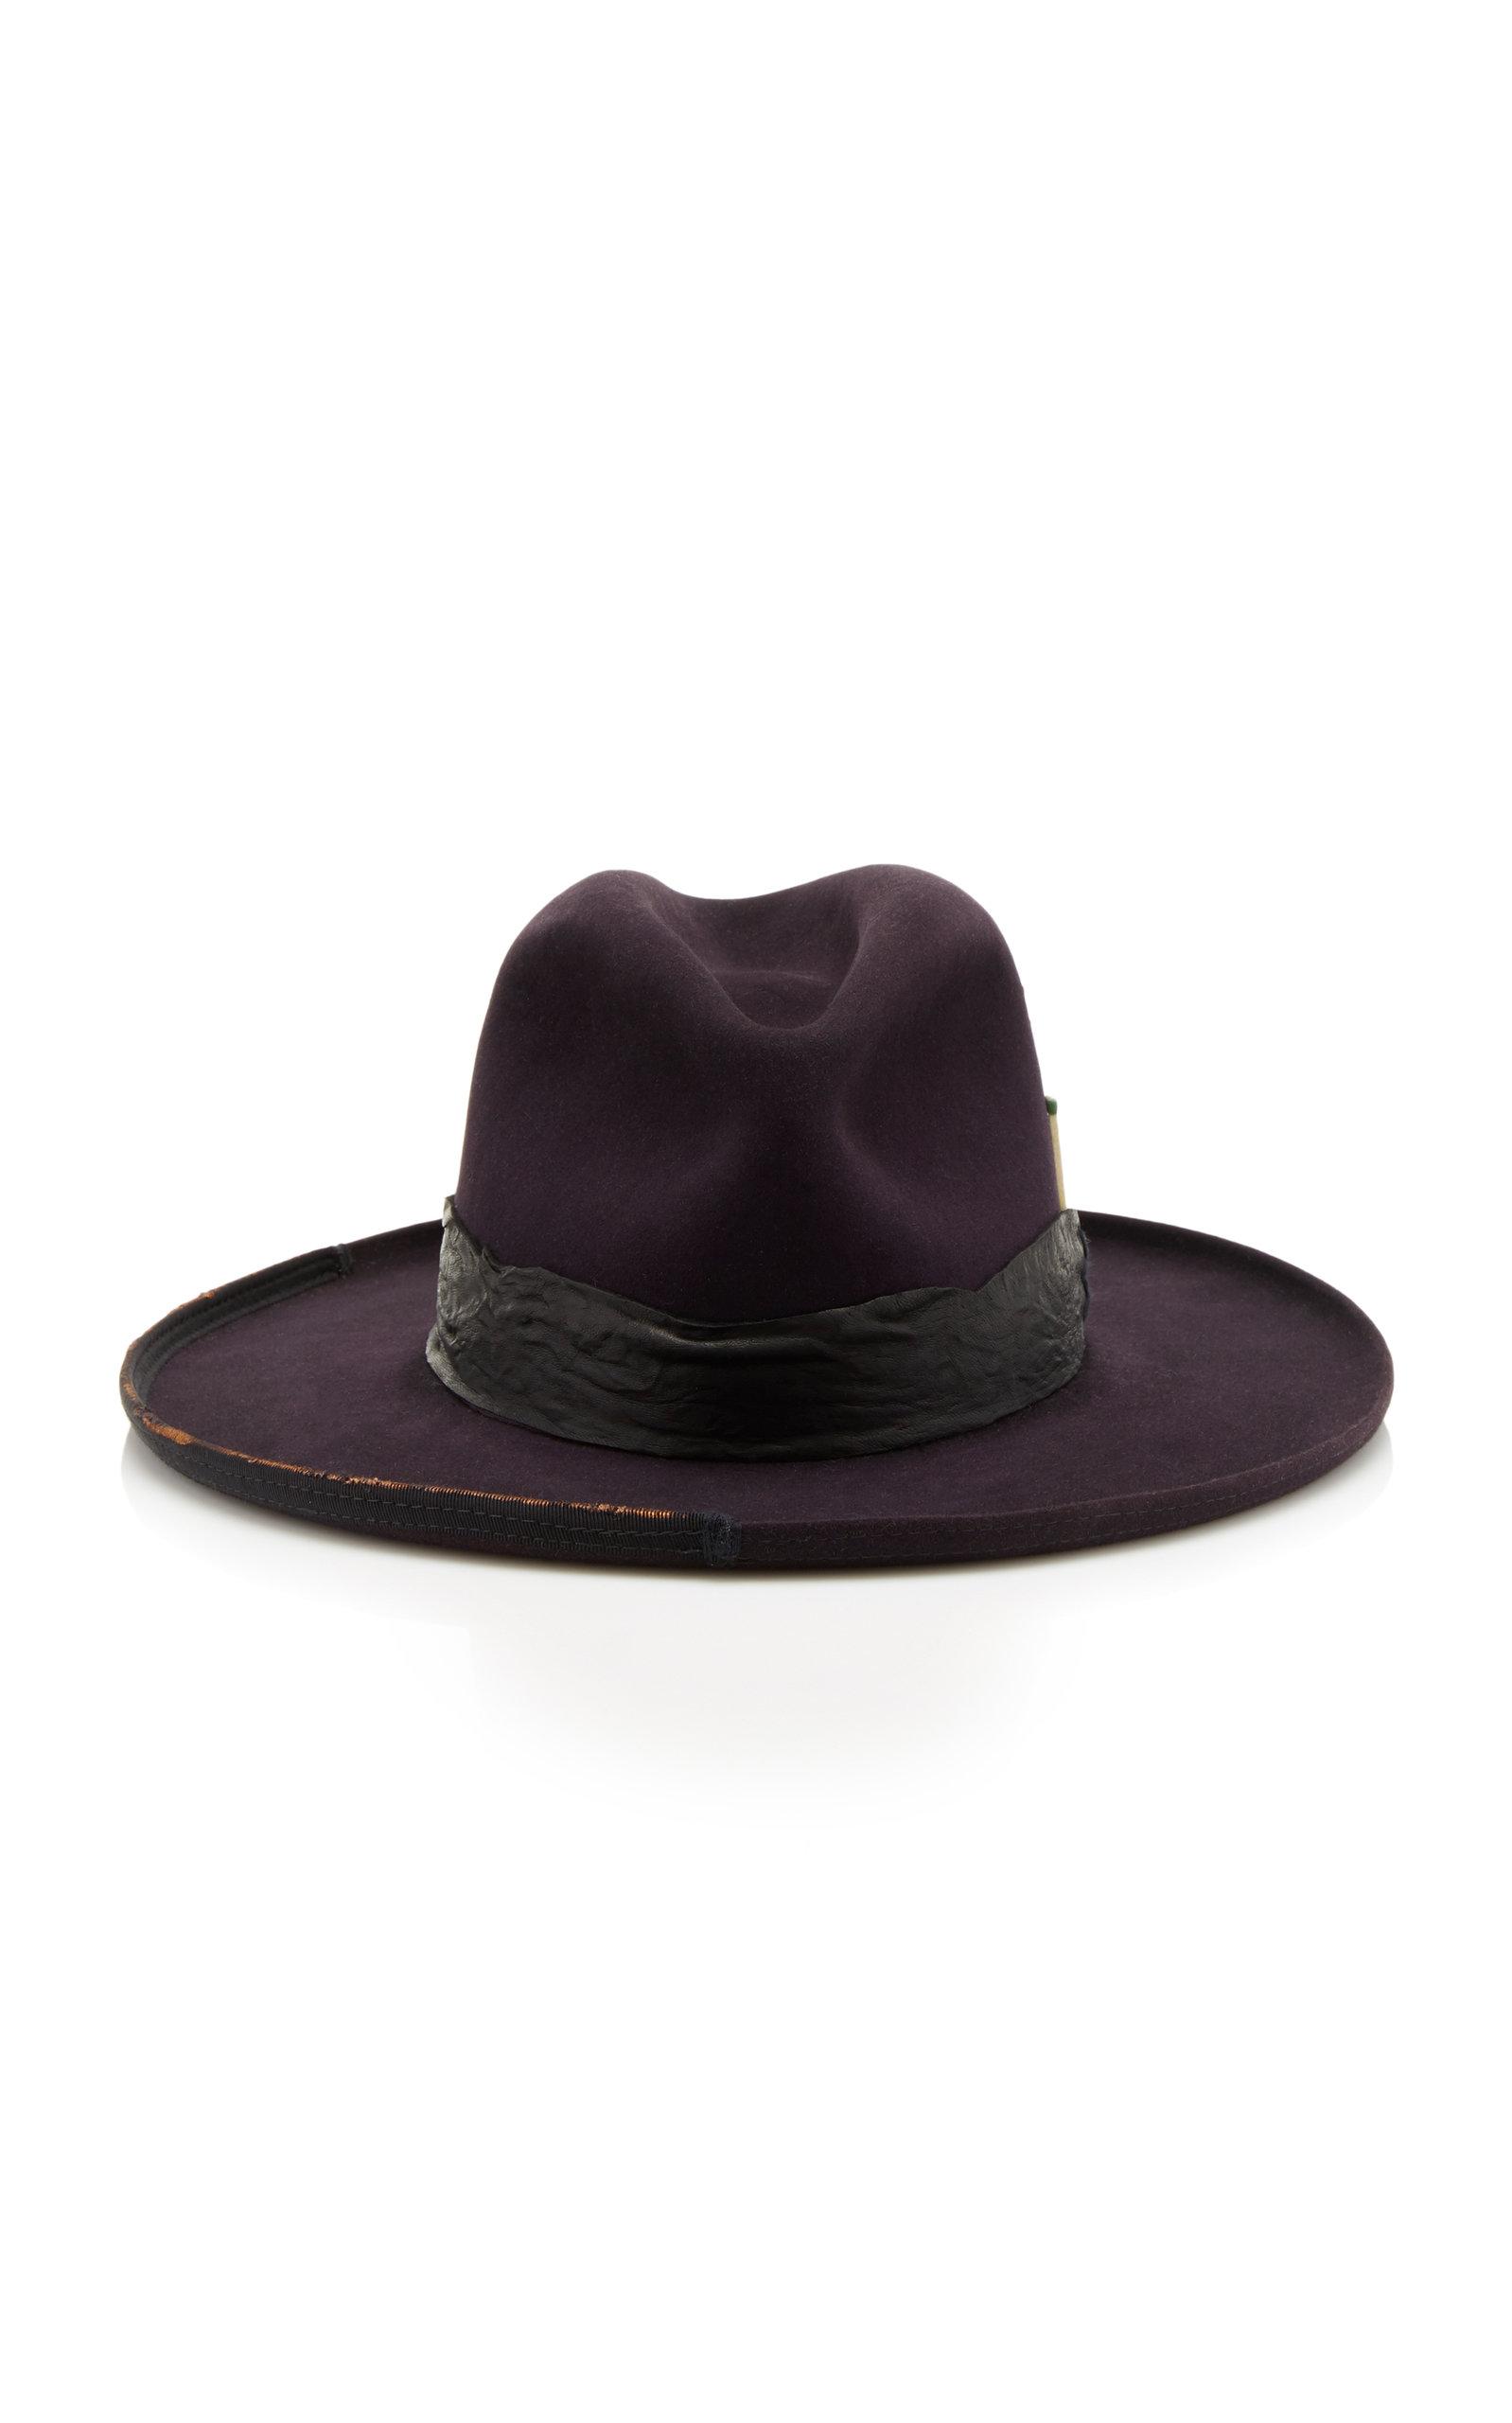 CACTUS STORM BEAVER FELT HAT